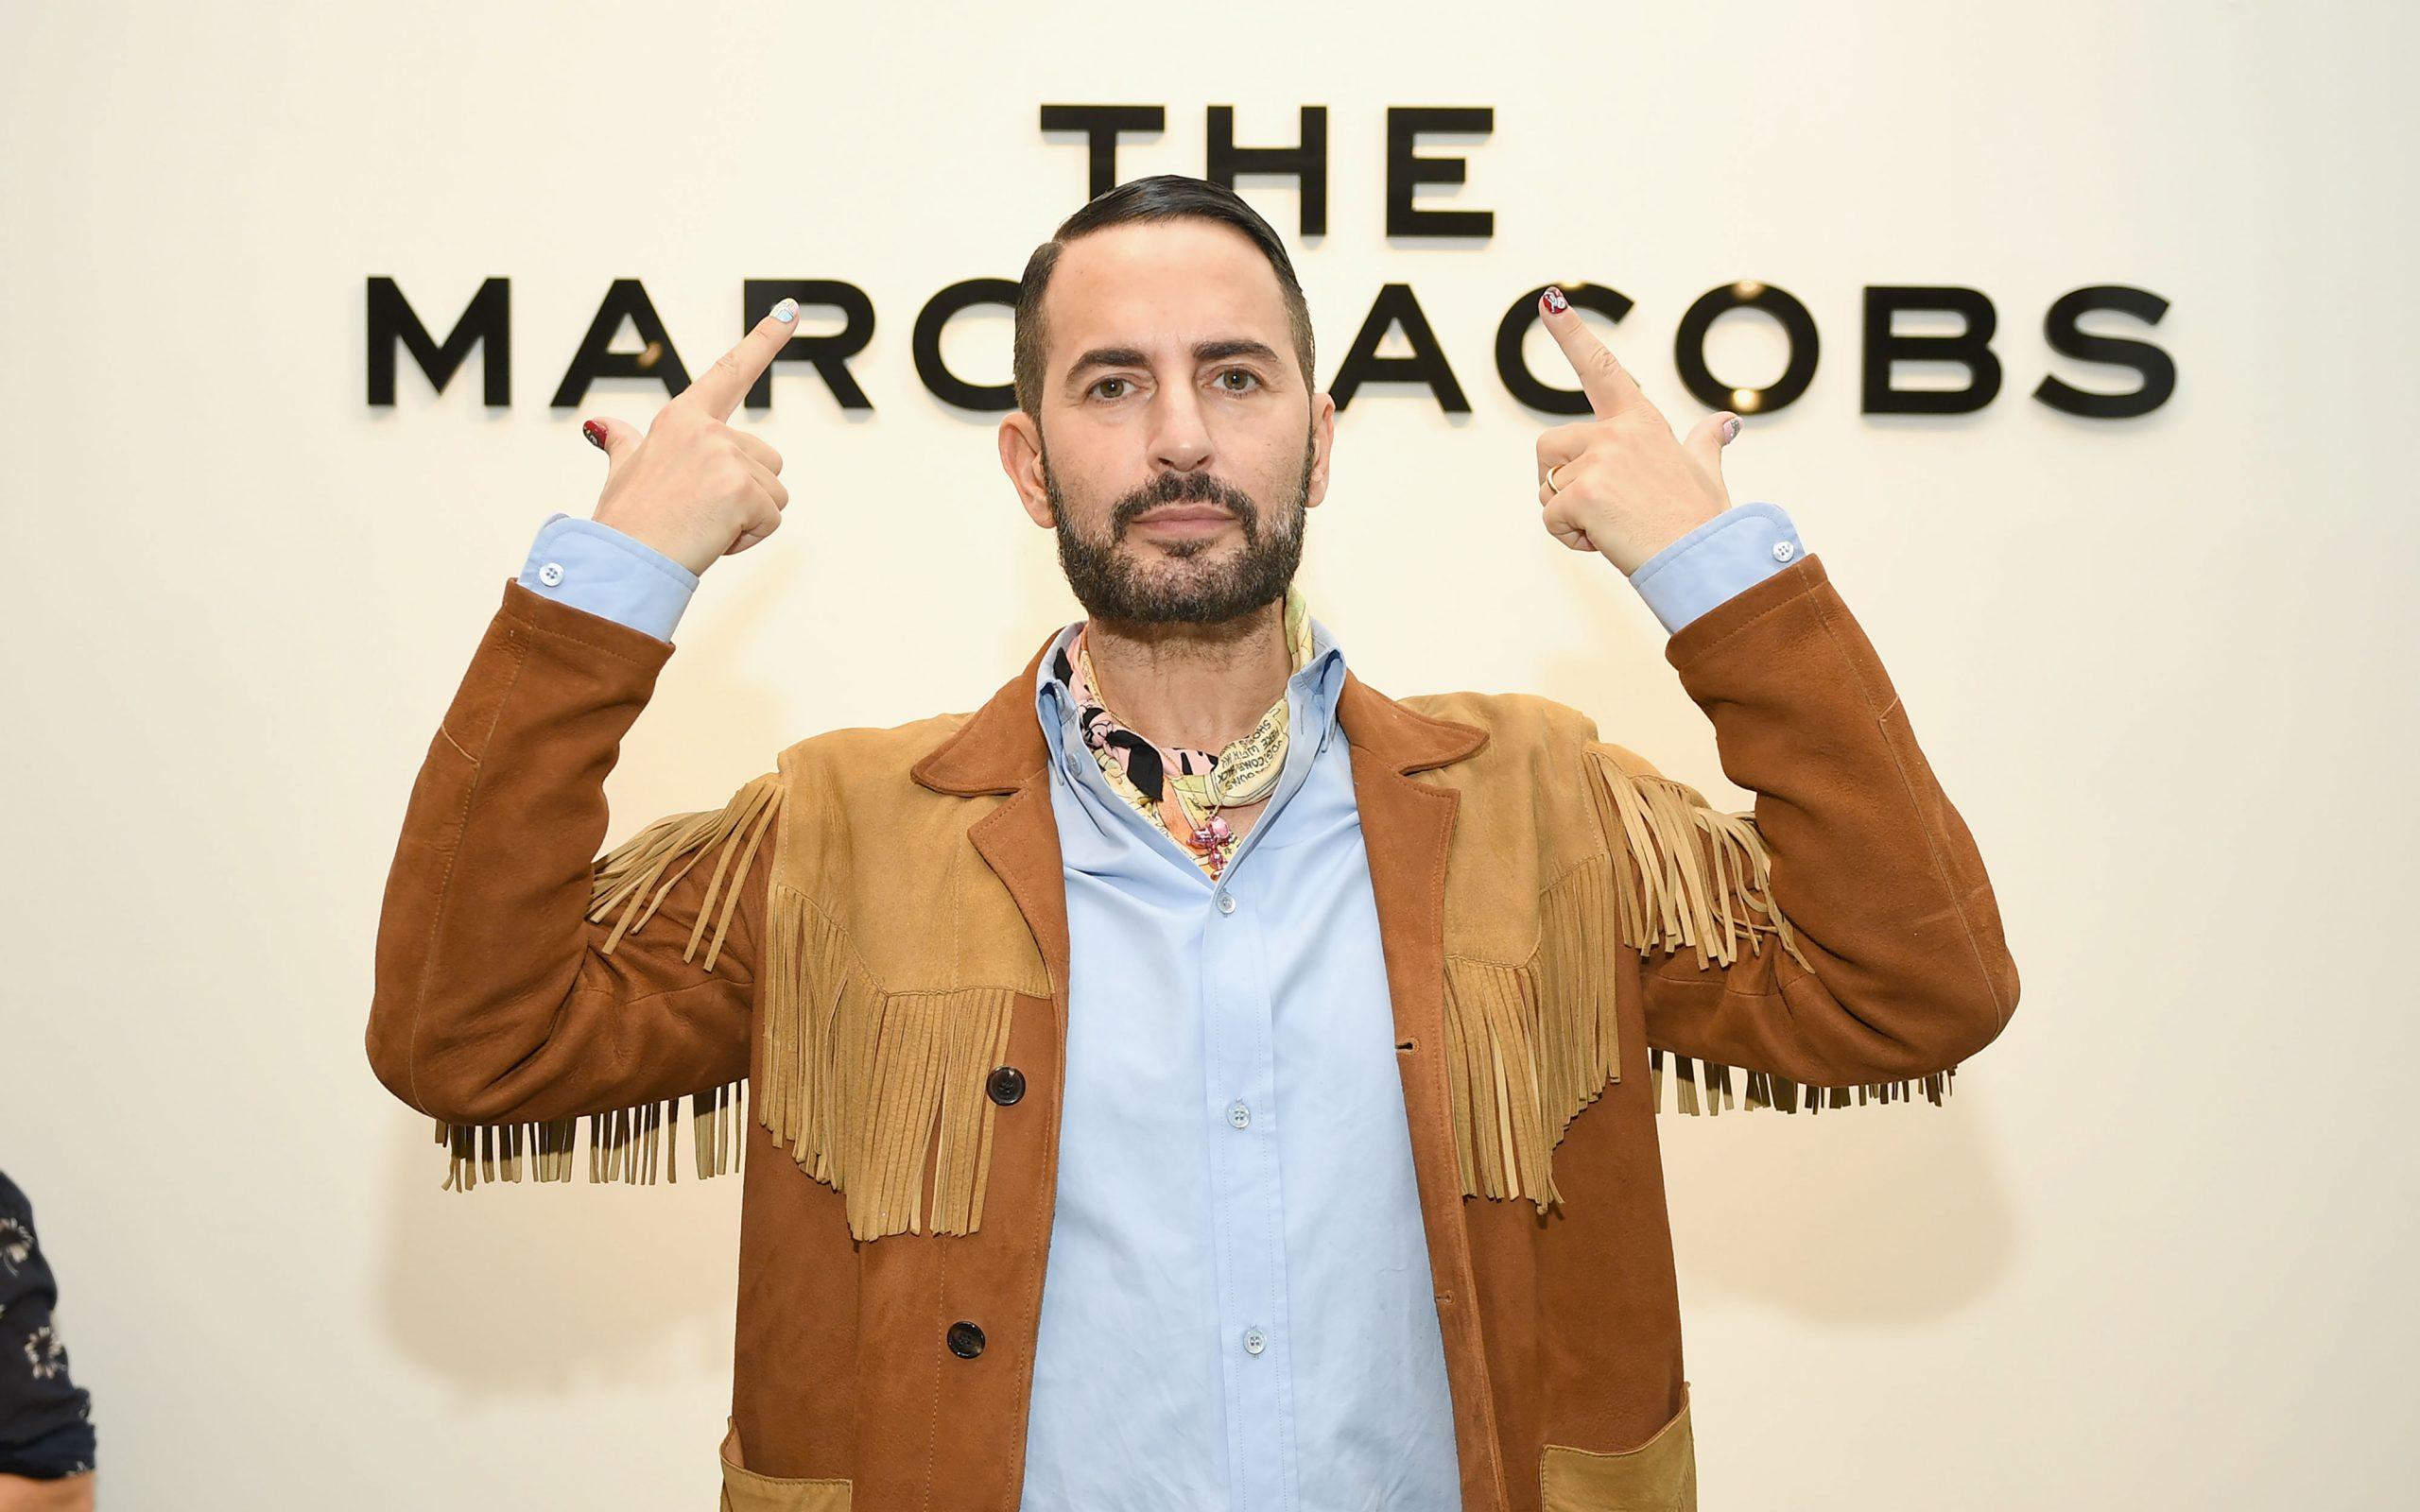 Marc Jacobs Facelift: Designer Shares Post-Plastic Surgery Selfie